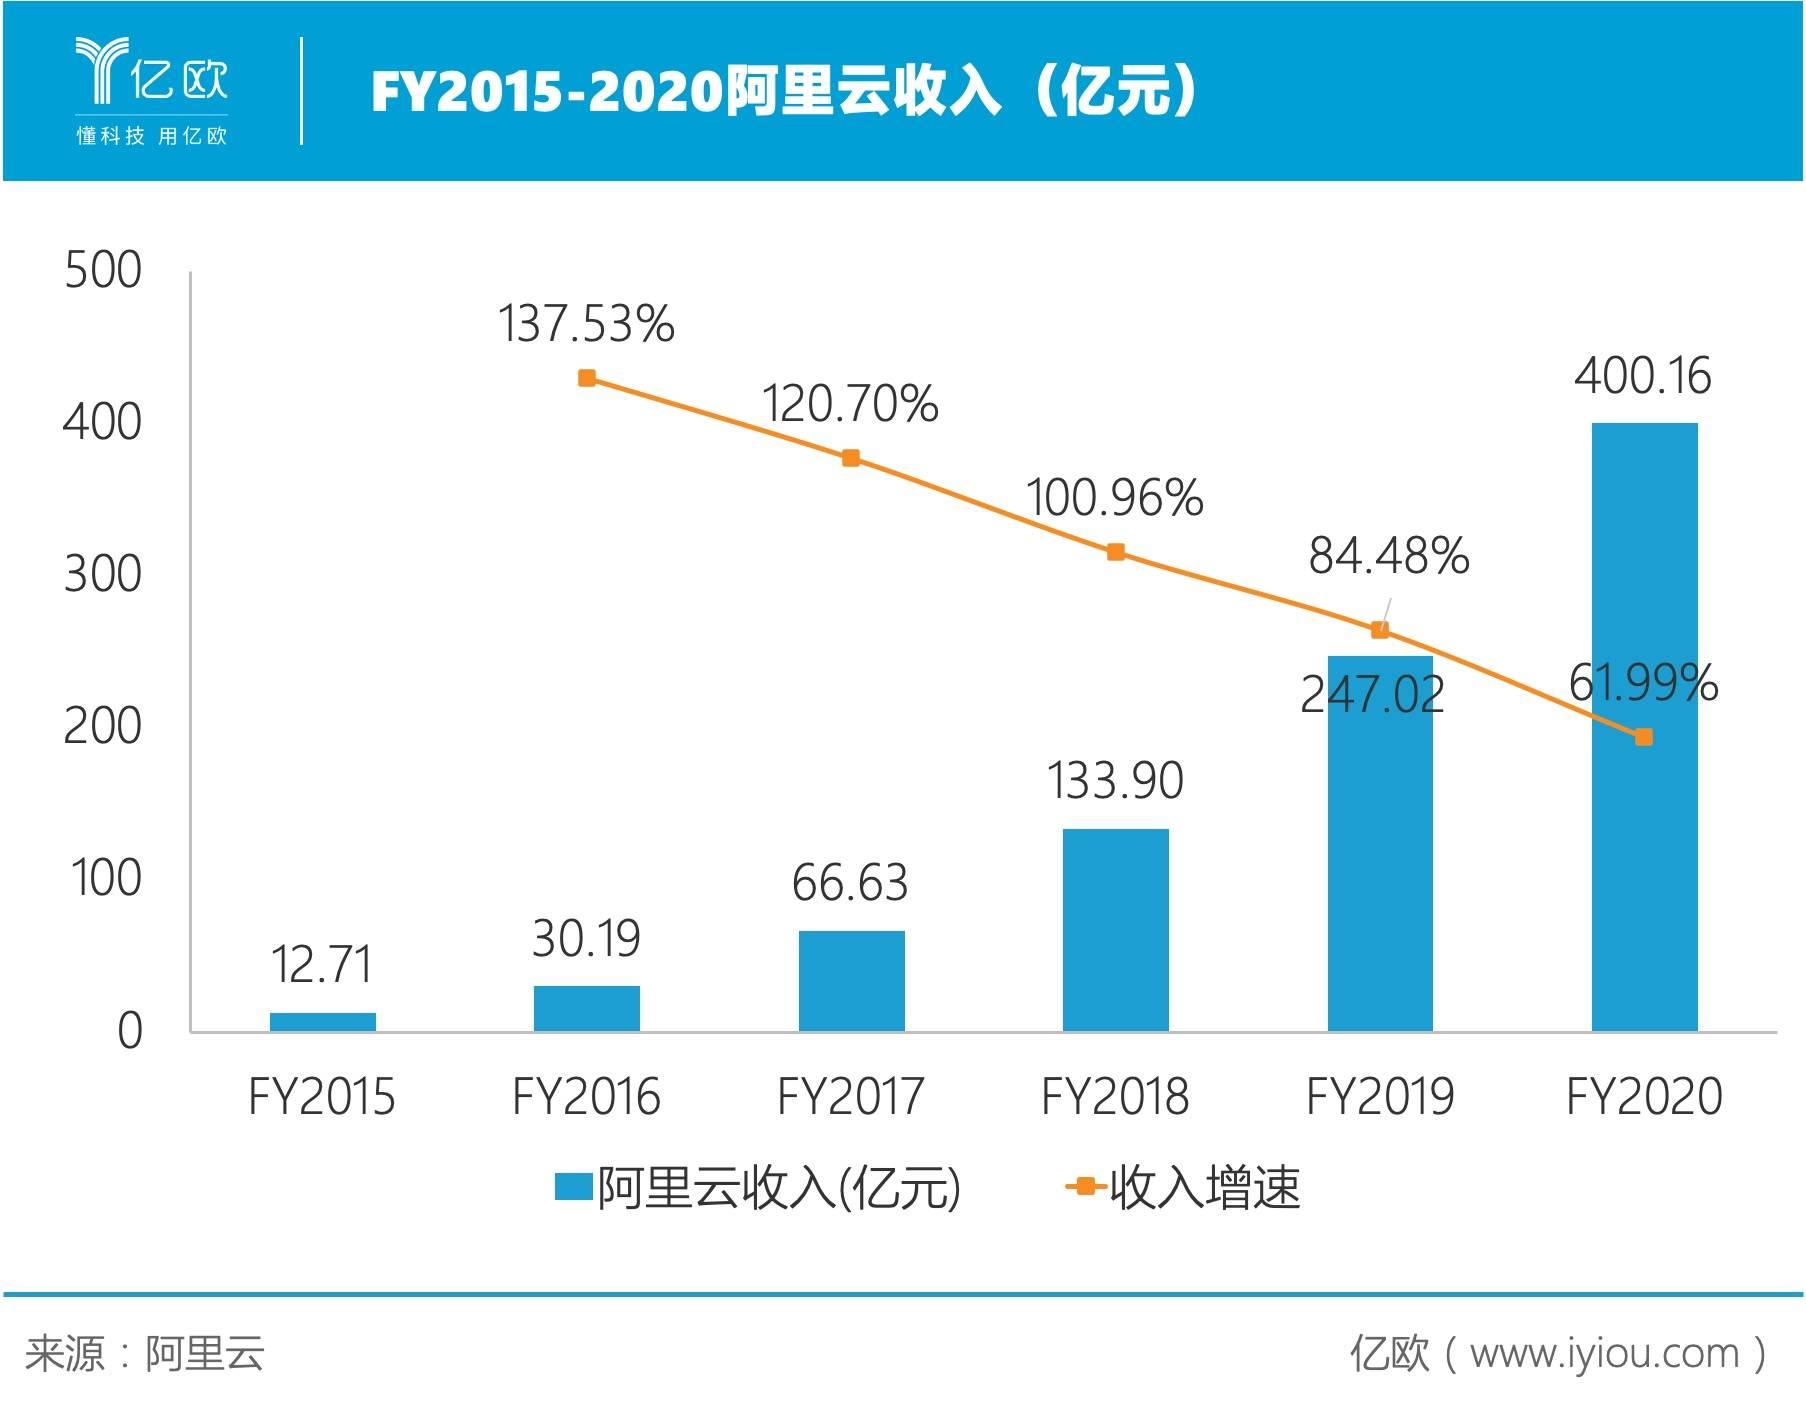 FY2015-2020阿里云收入(亿元).jpg.jpg